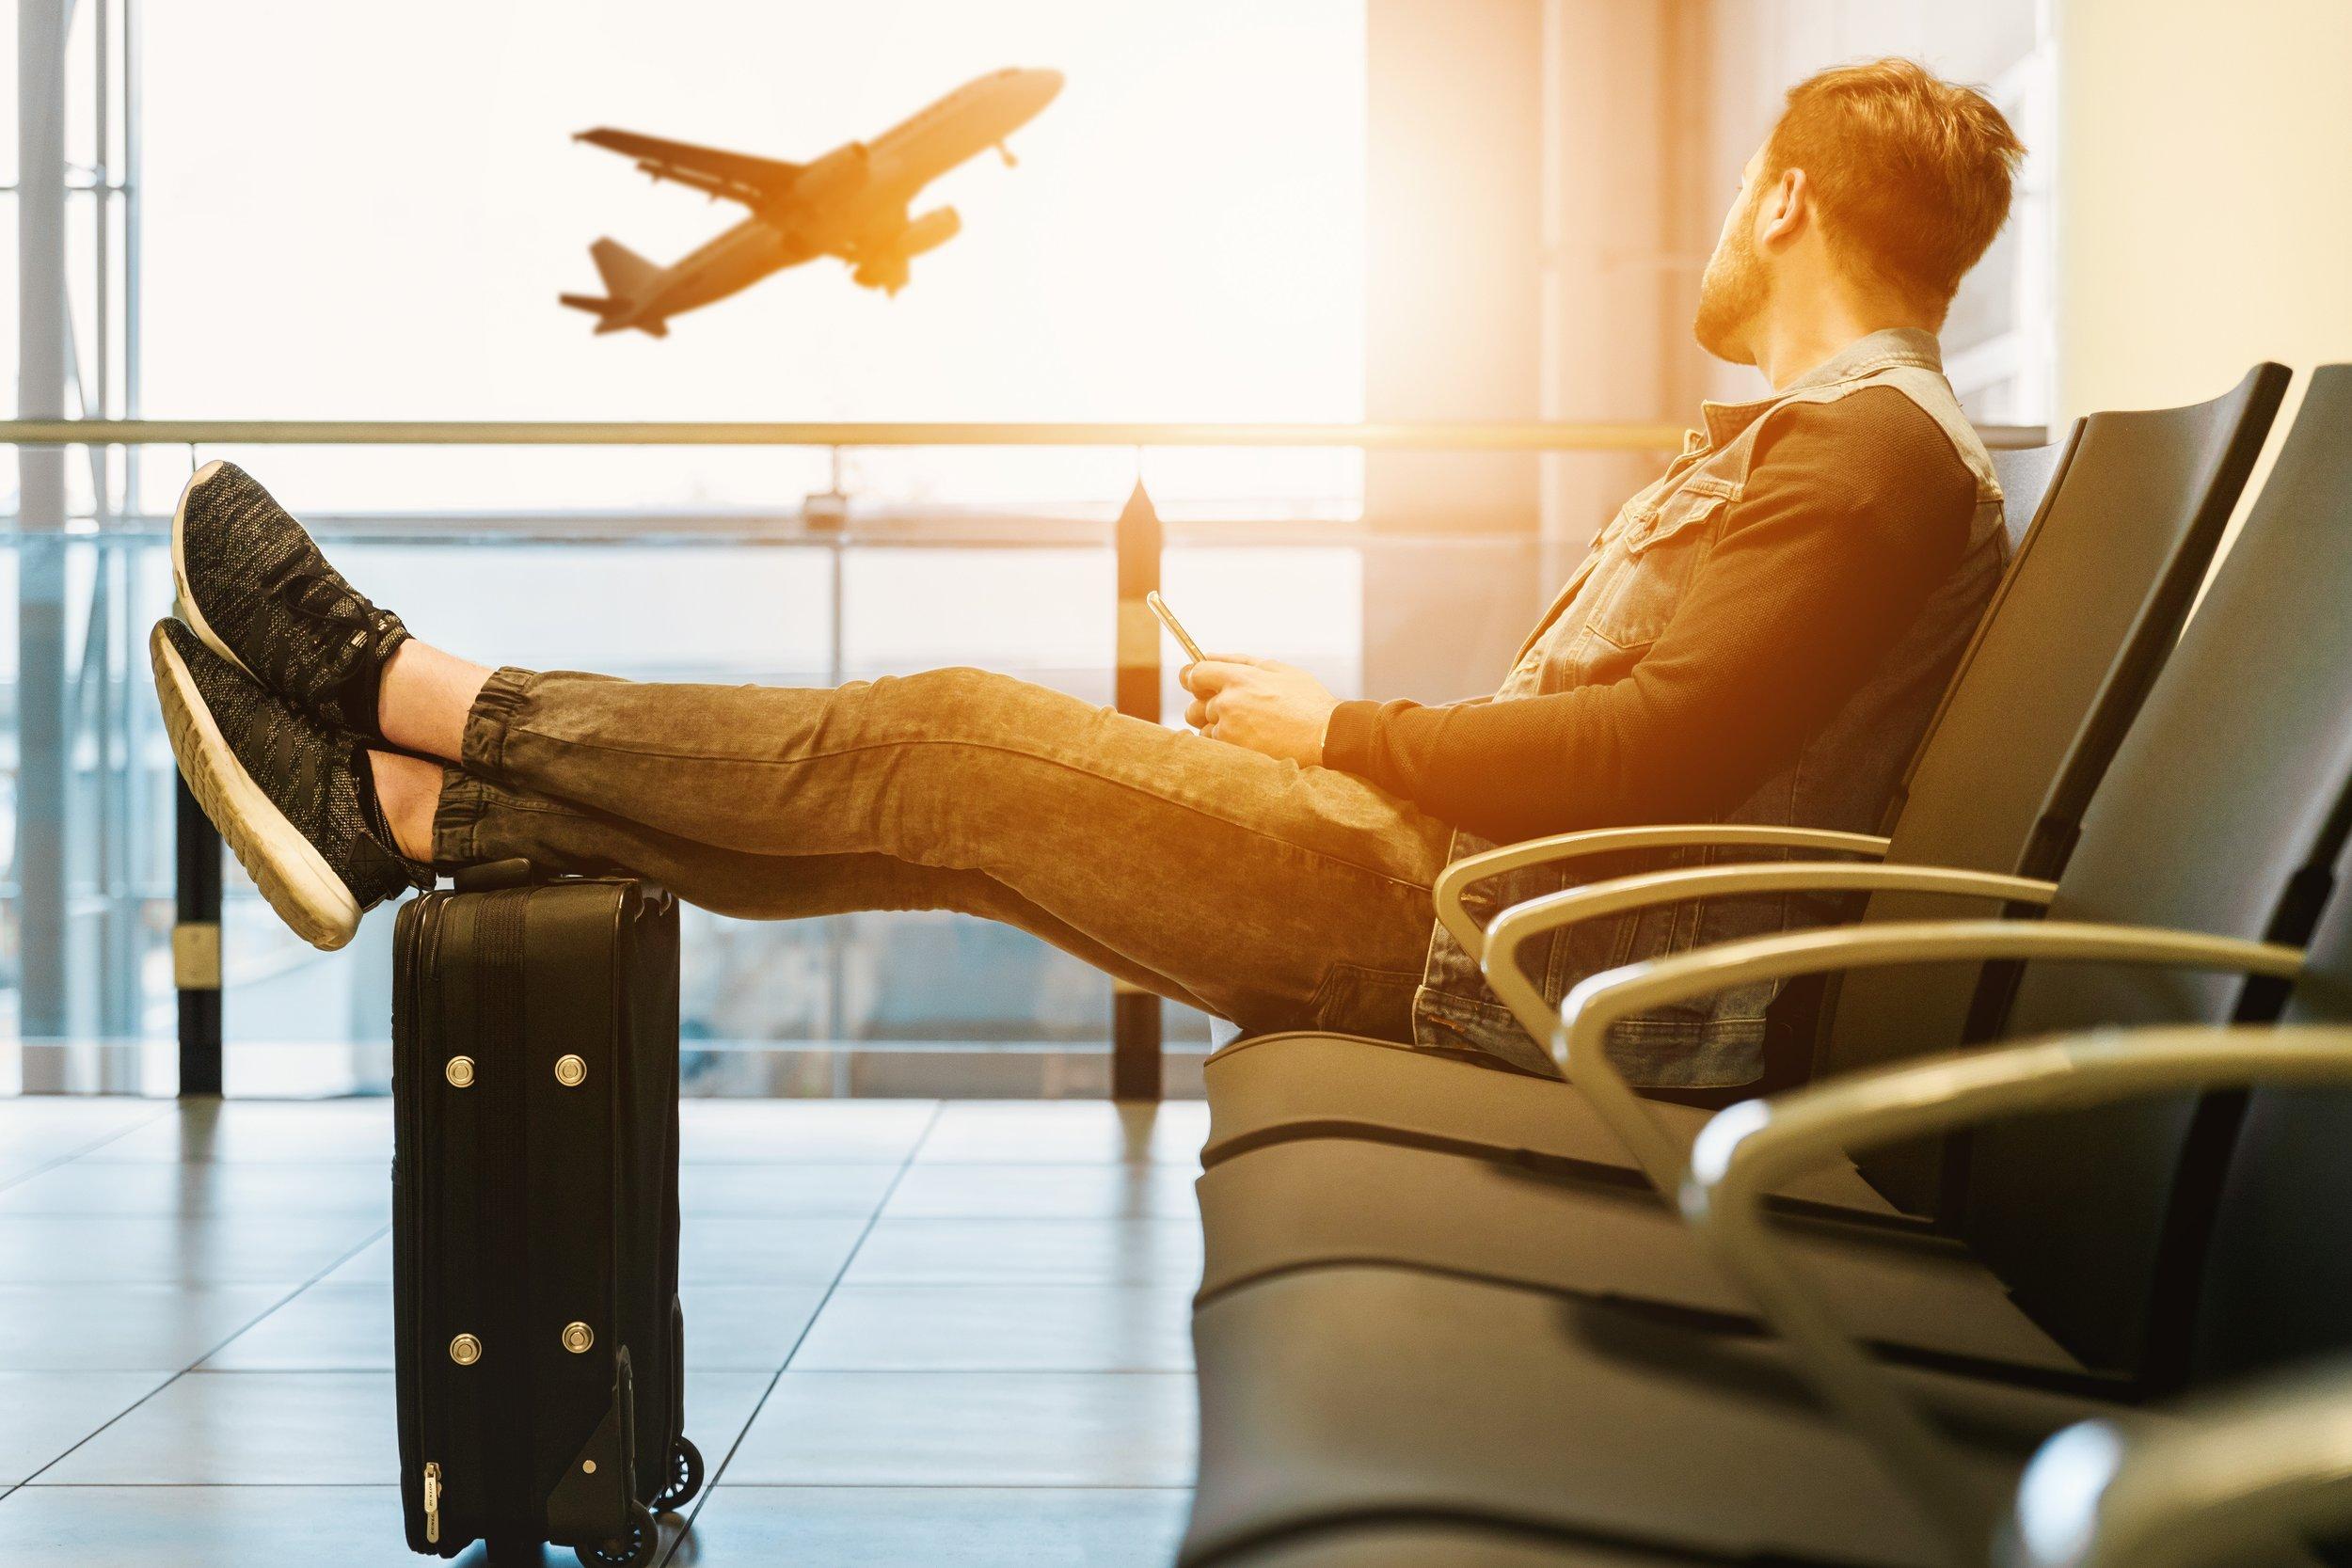 Macros & Travel